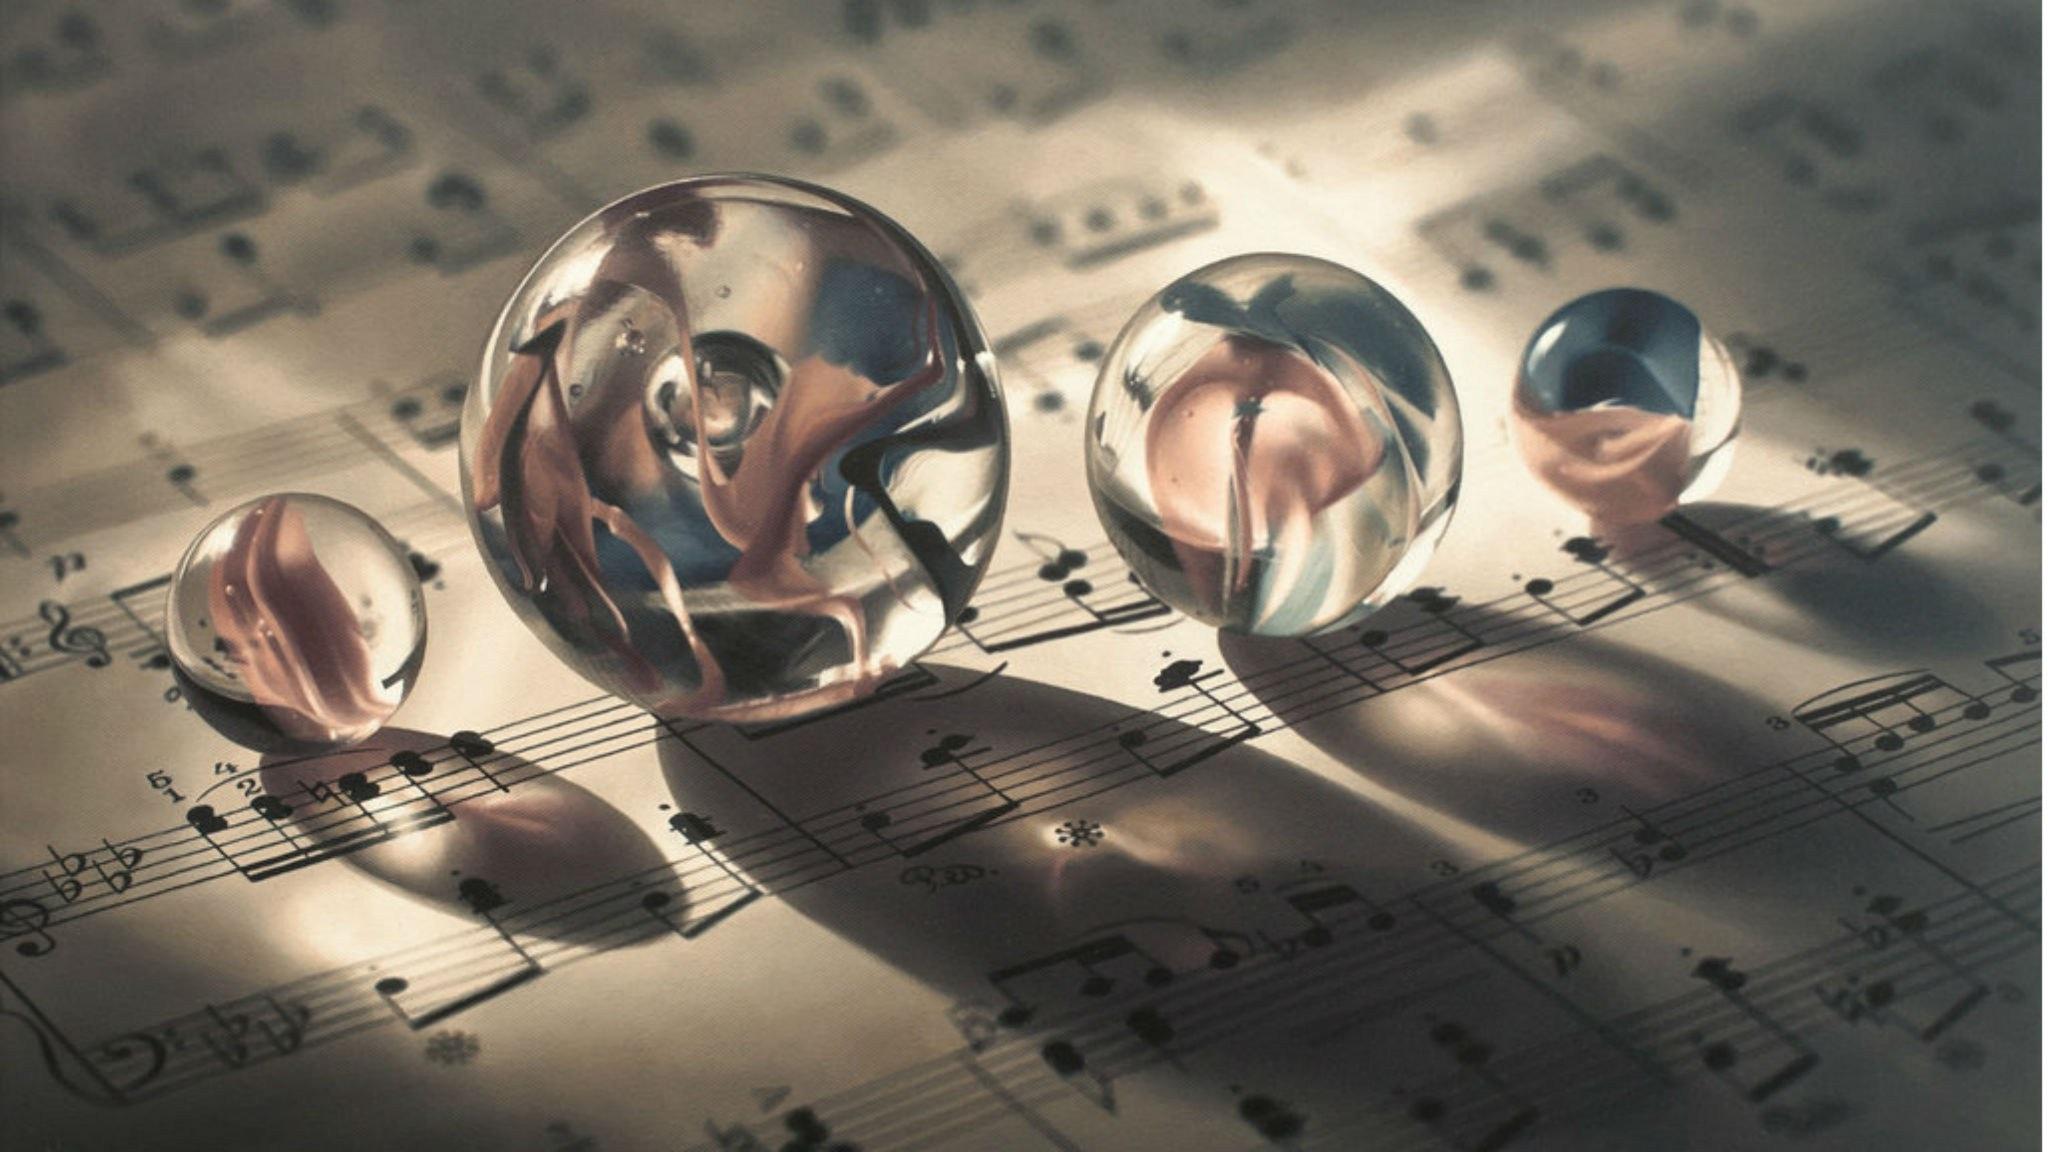 Matematik, harmonik och himmelsmekanik